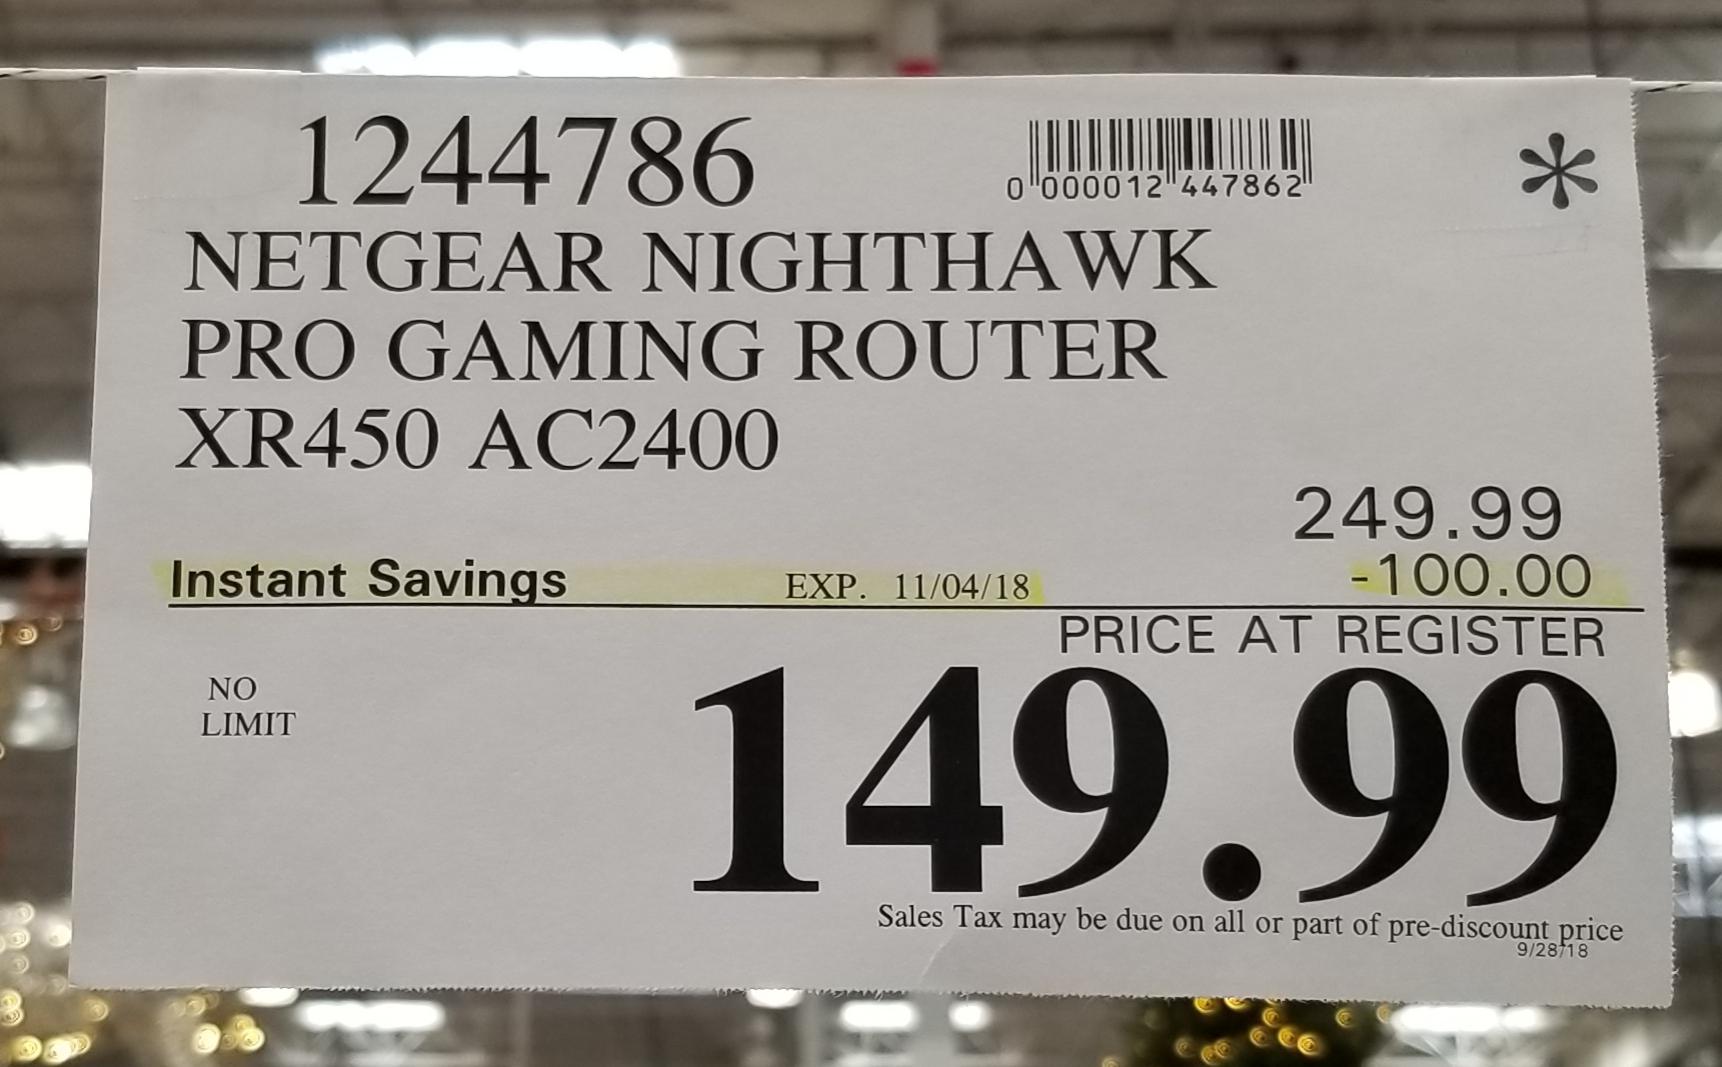 Costco Netgear Nighthawk XR450 Router (B&M) $149 99